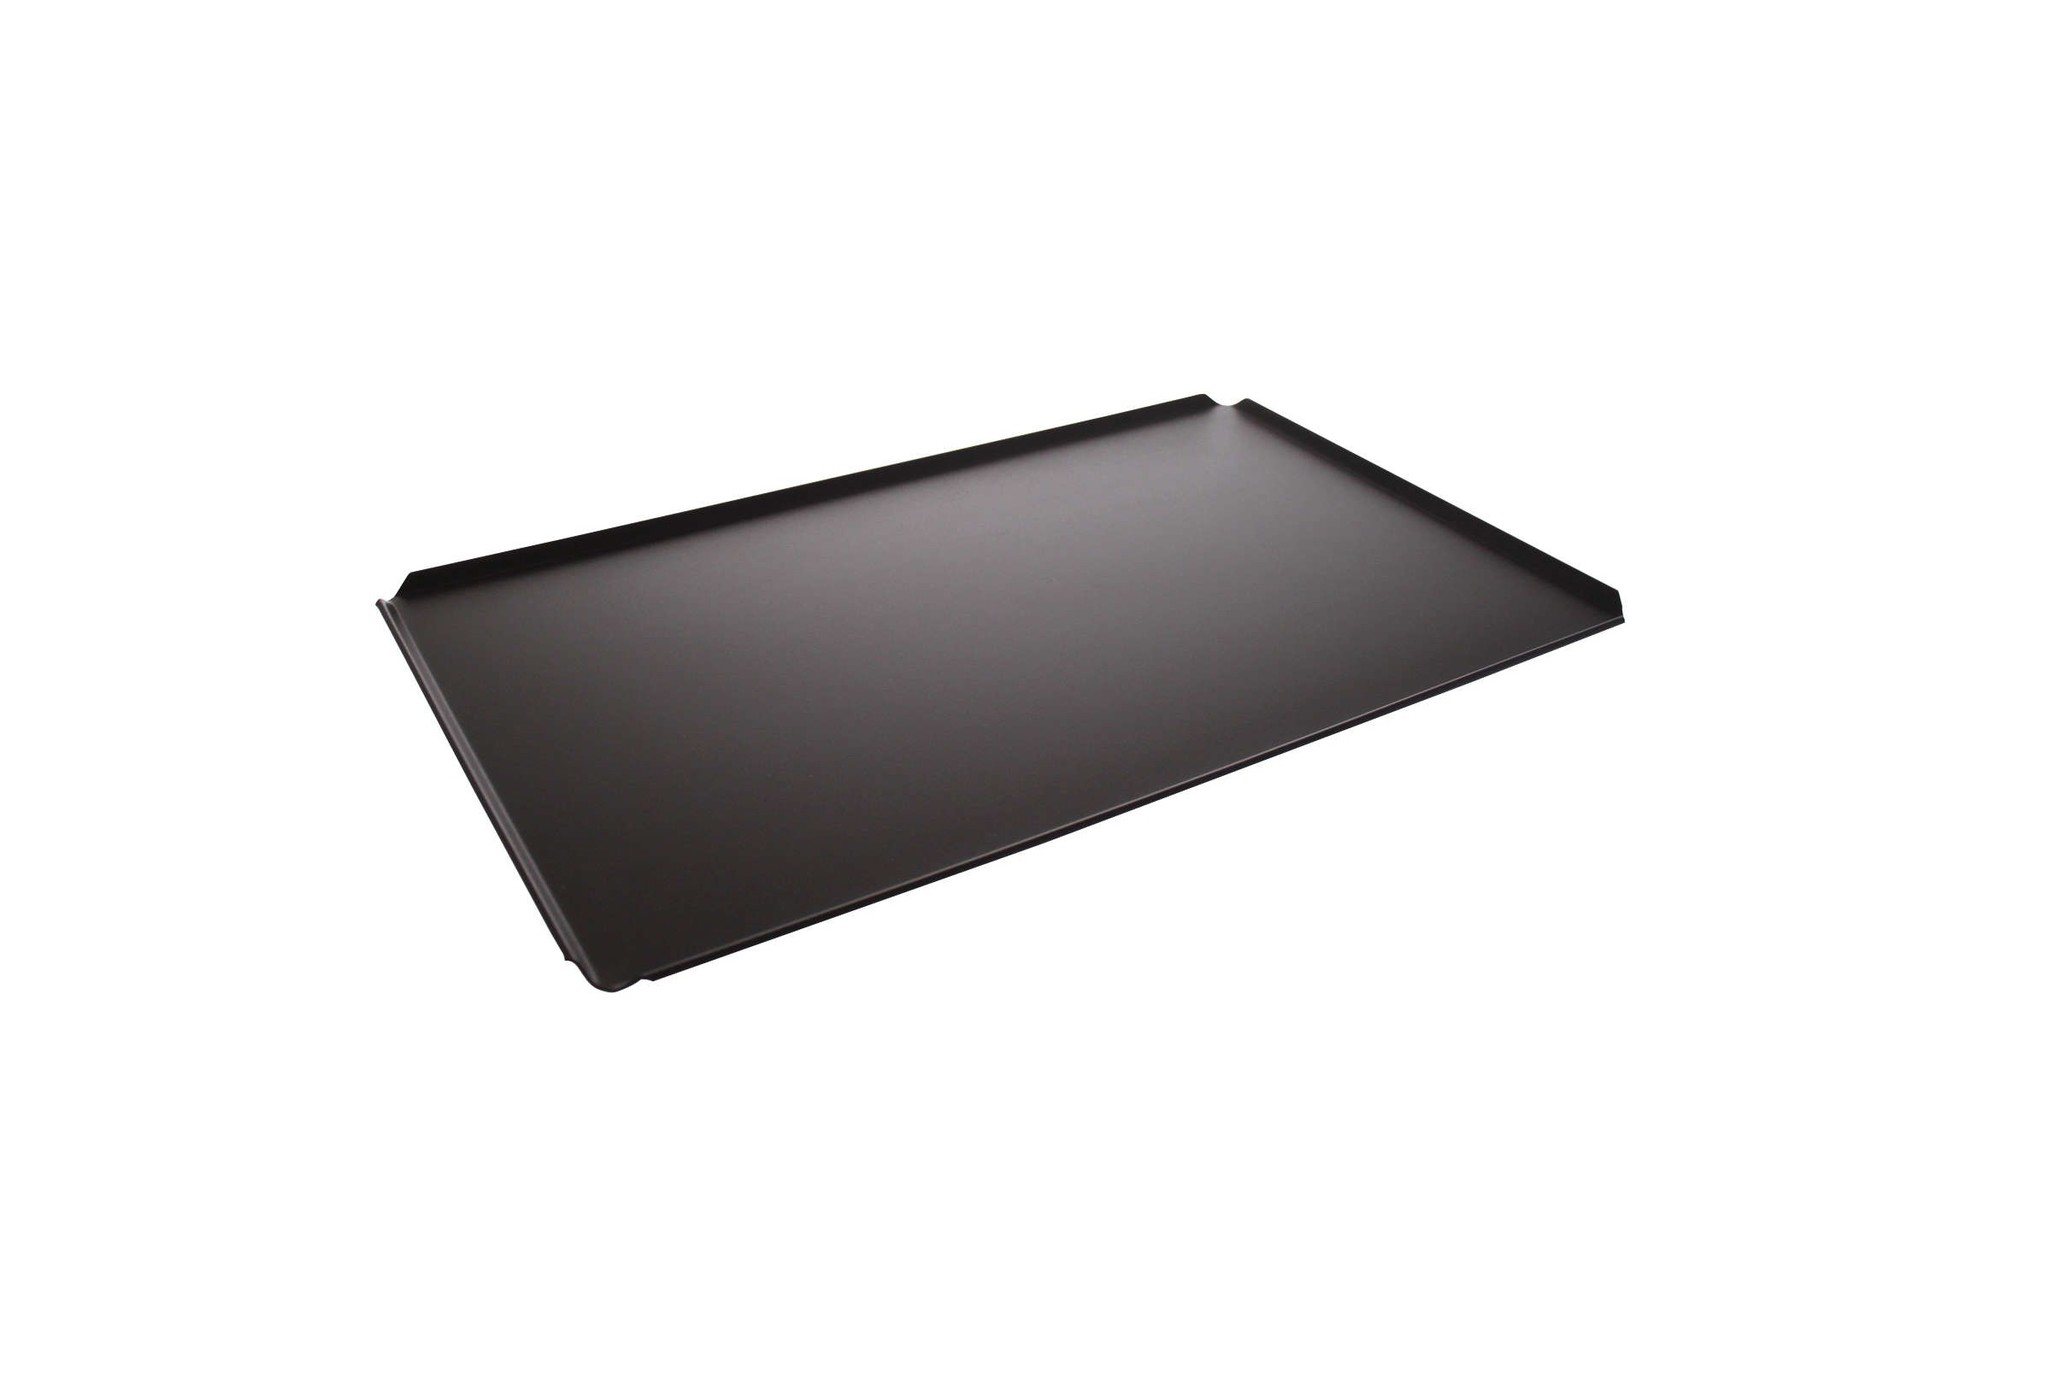 Schneider Aluminum baking tray 1 / 1GN, teflon